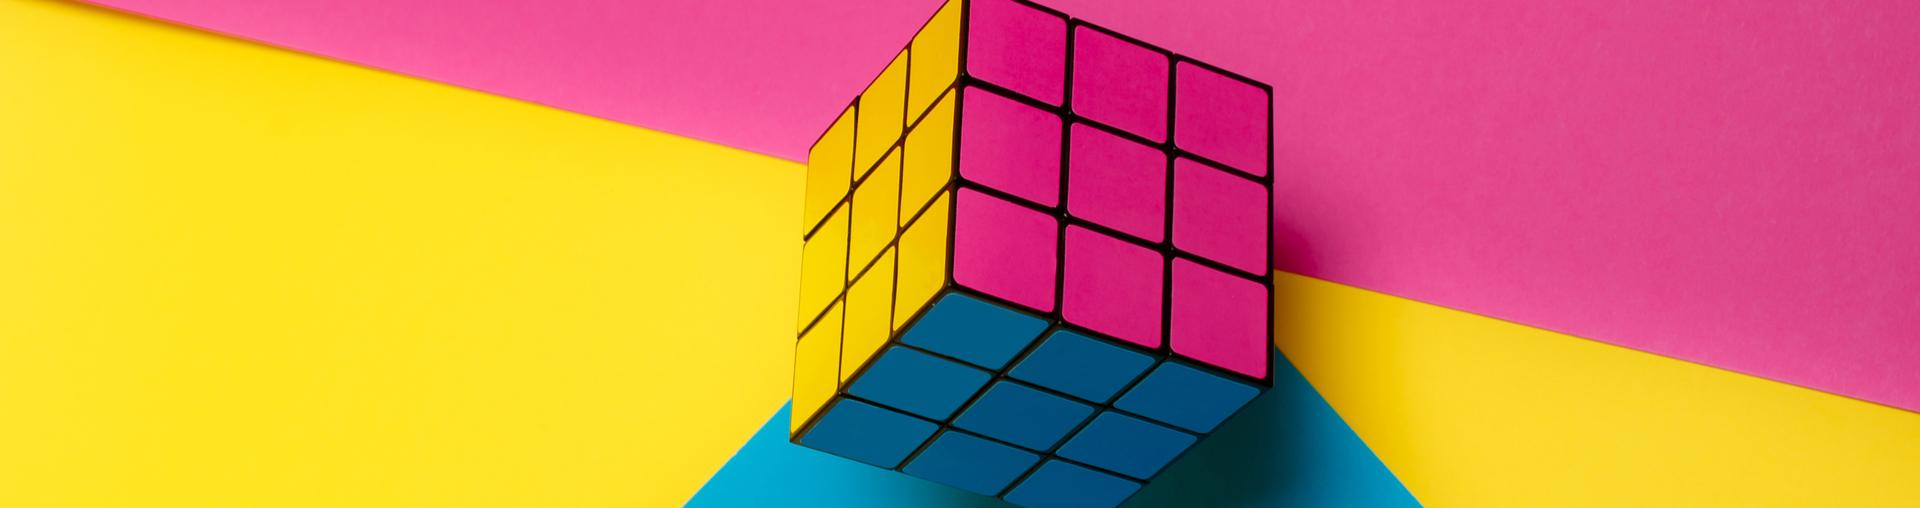 analiza S.W.O.T cub rubik